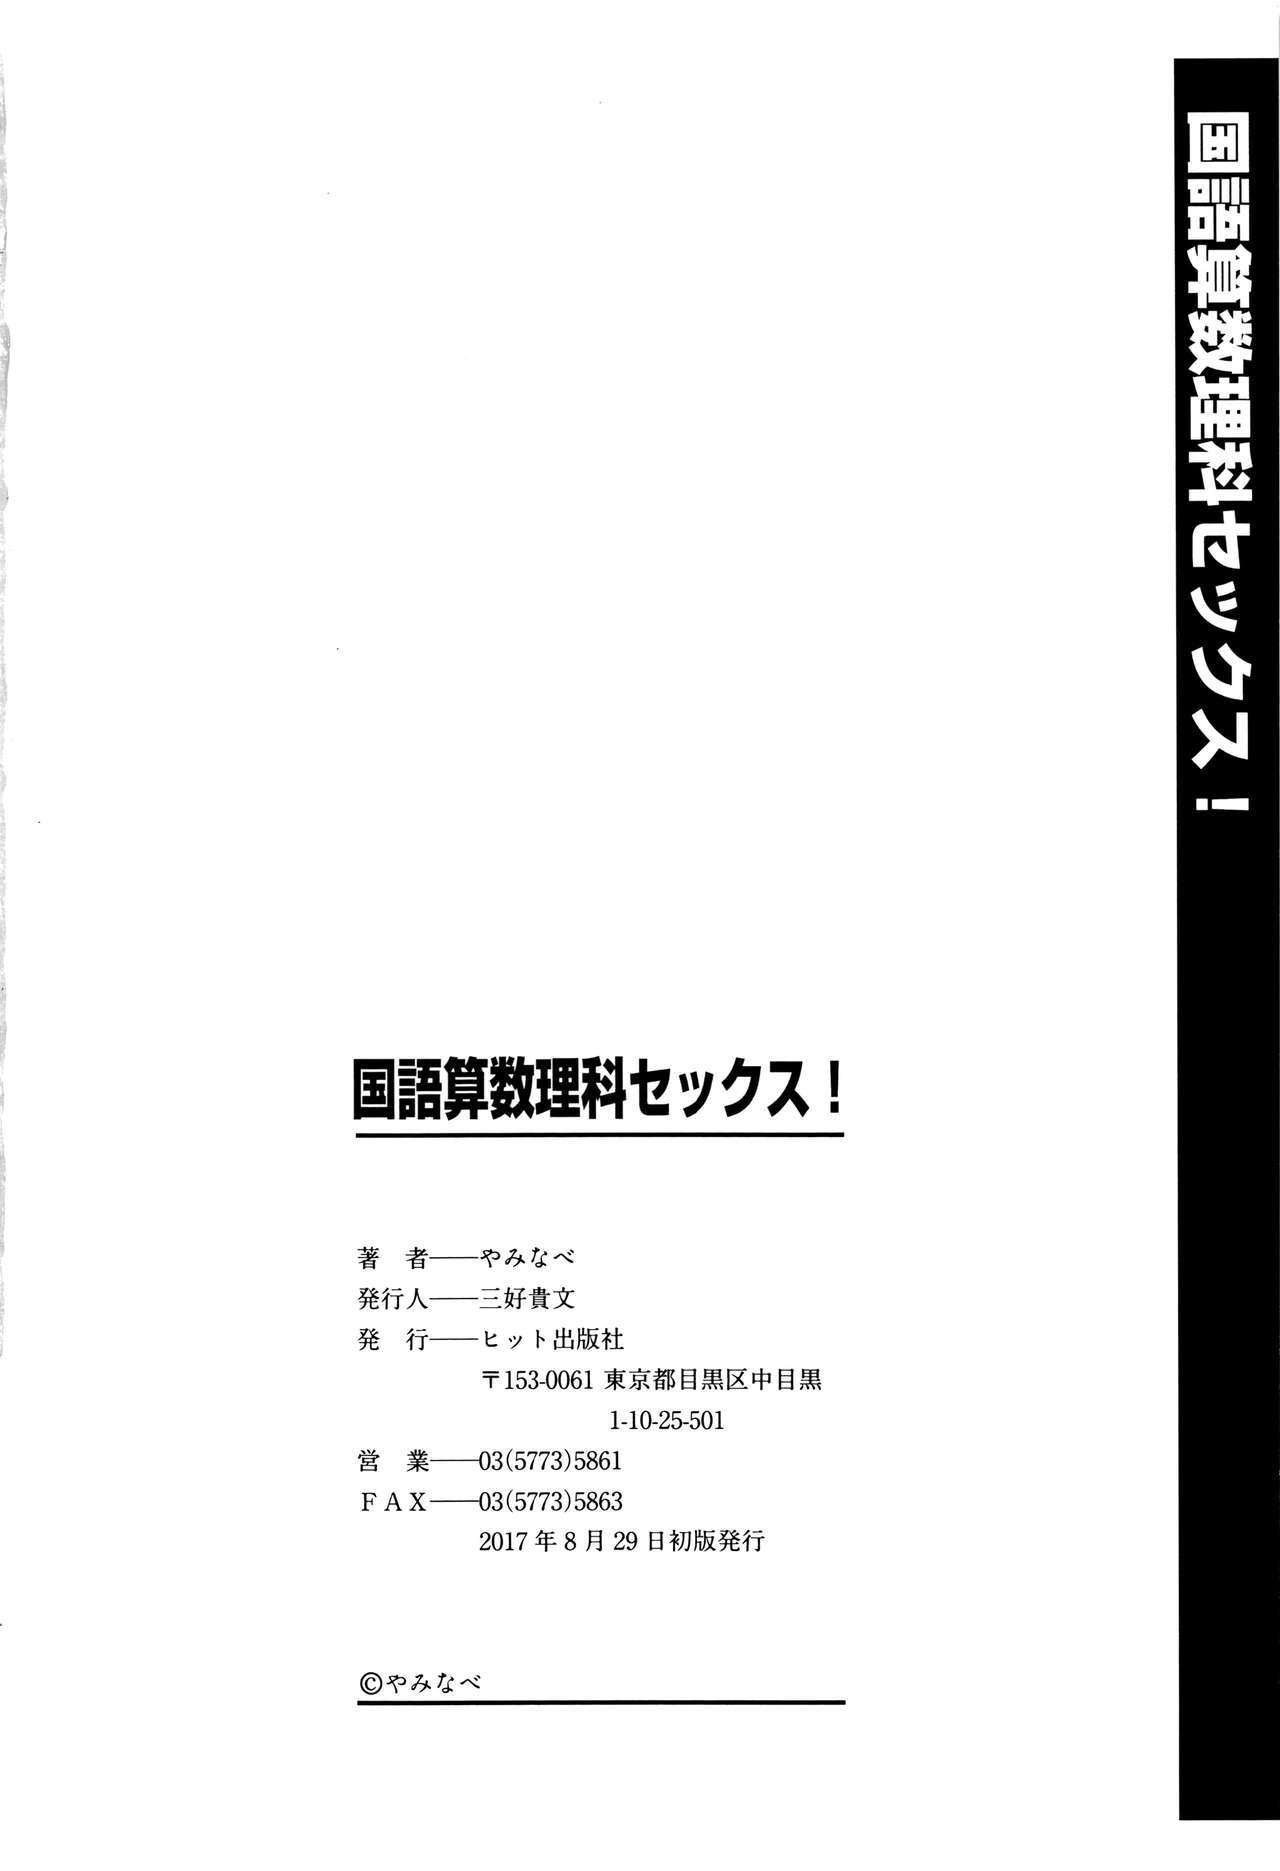 Kokugo Sansuu Rika Sex 196